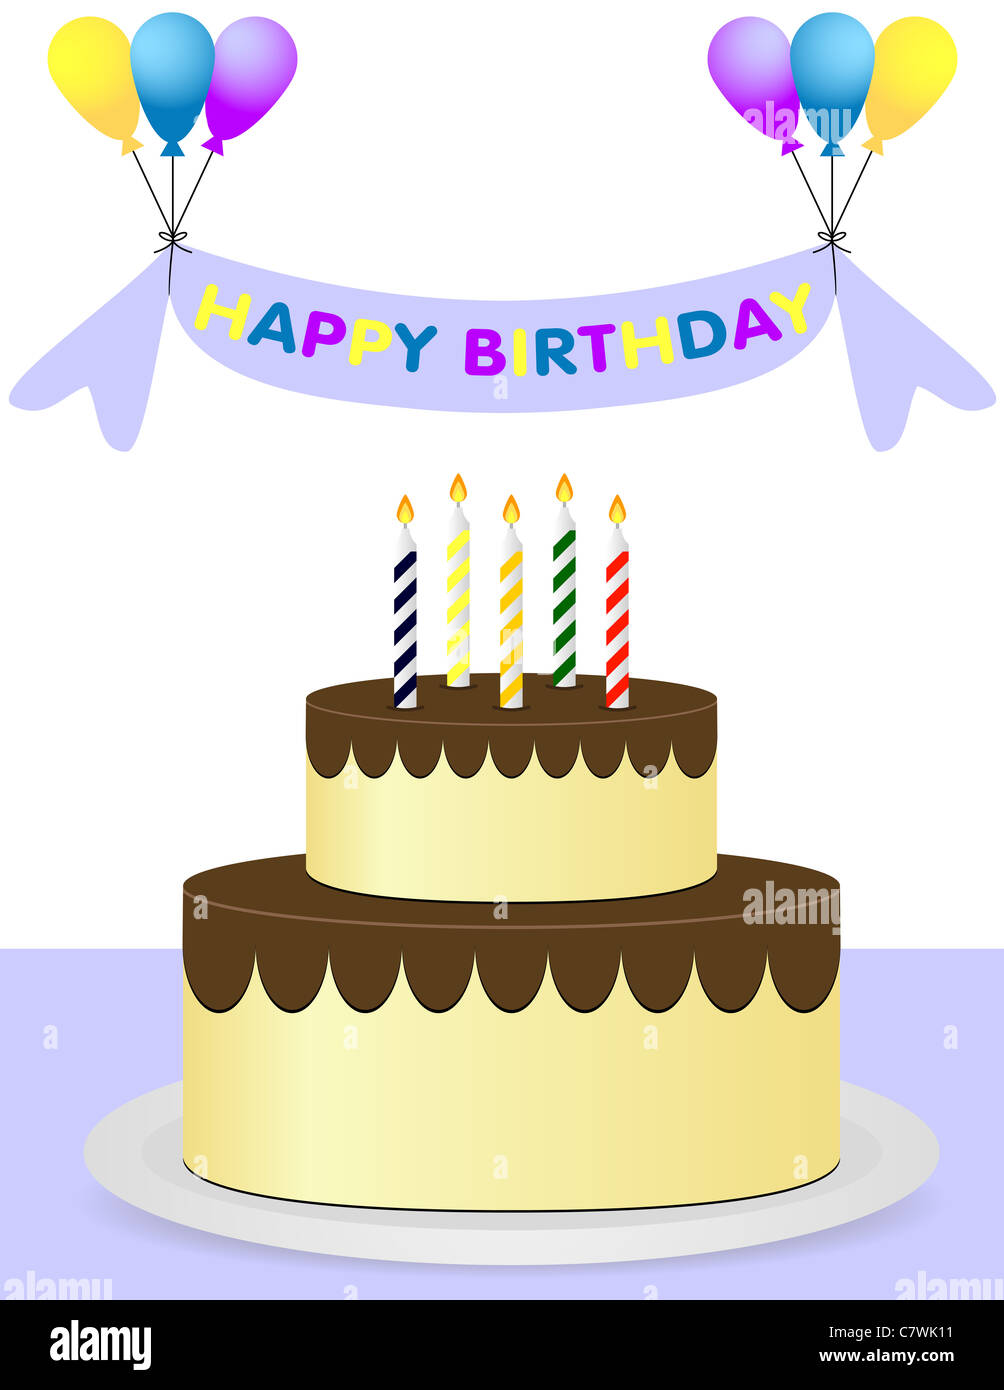 Strange Happy Birthday Background With Cake And Balloons Stock Photo Funny Birthday Cards Online Elaedamsfinfo